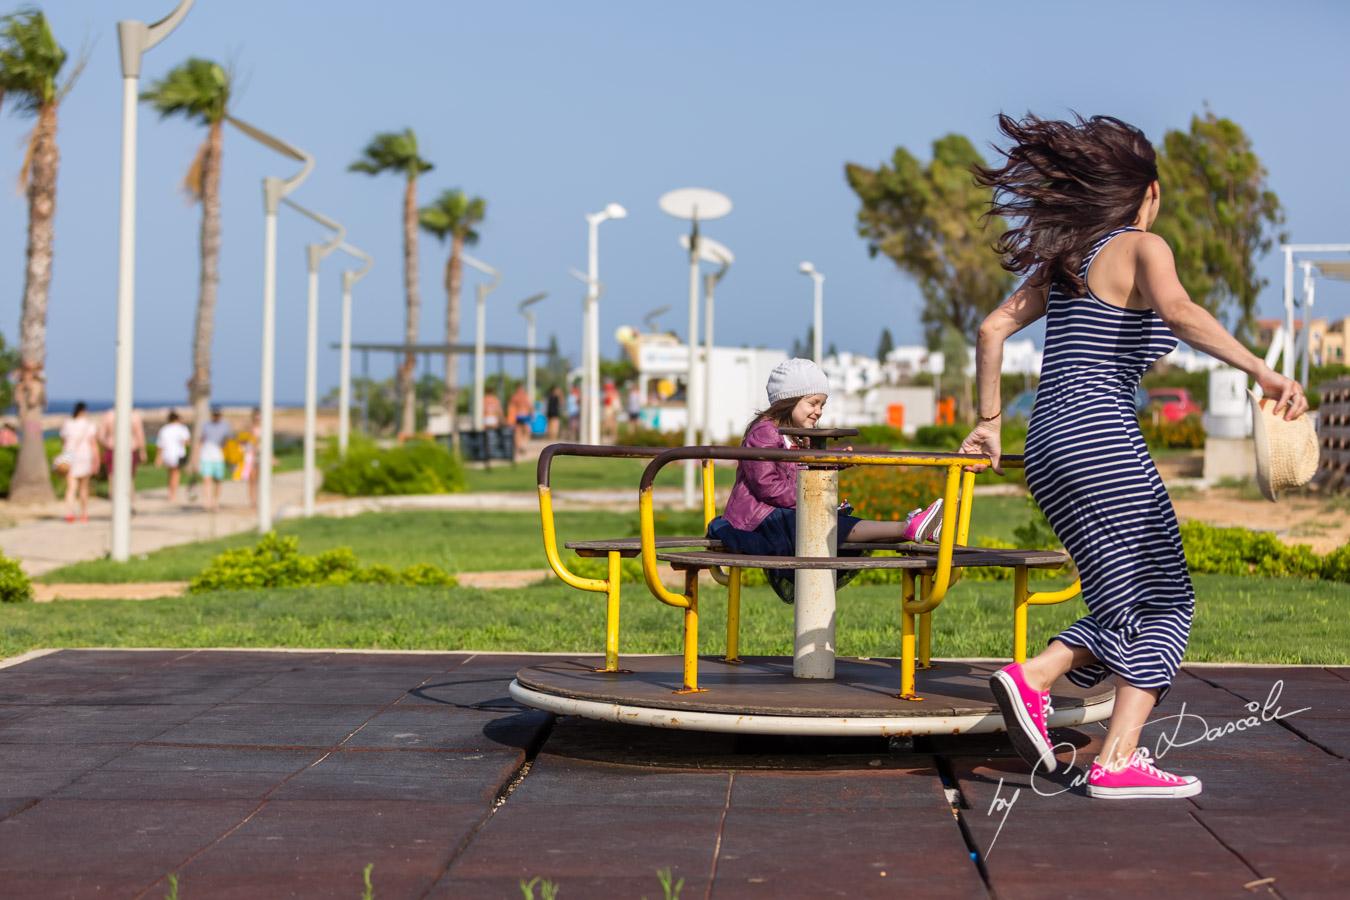 A Family Photo Shoot in Protaras, Cyprus - 10